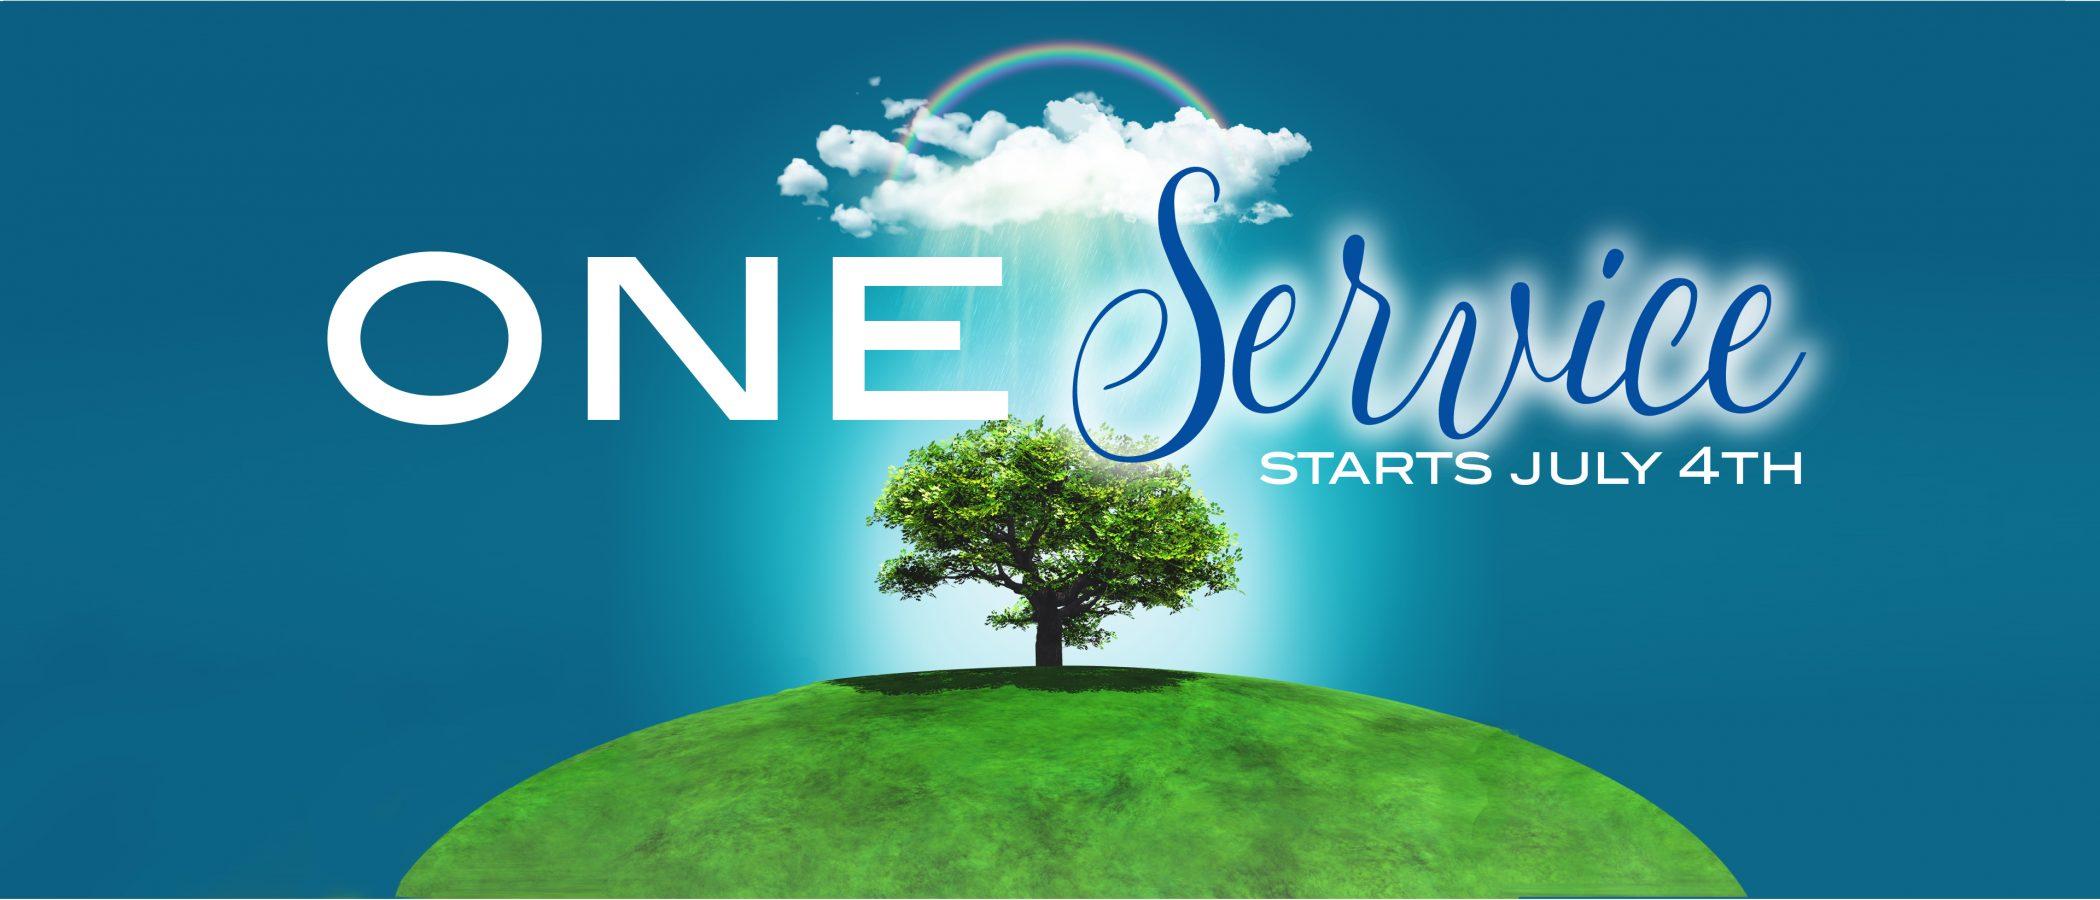 one-service-one-summer-11brd-dq2021-web-banner2x-100